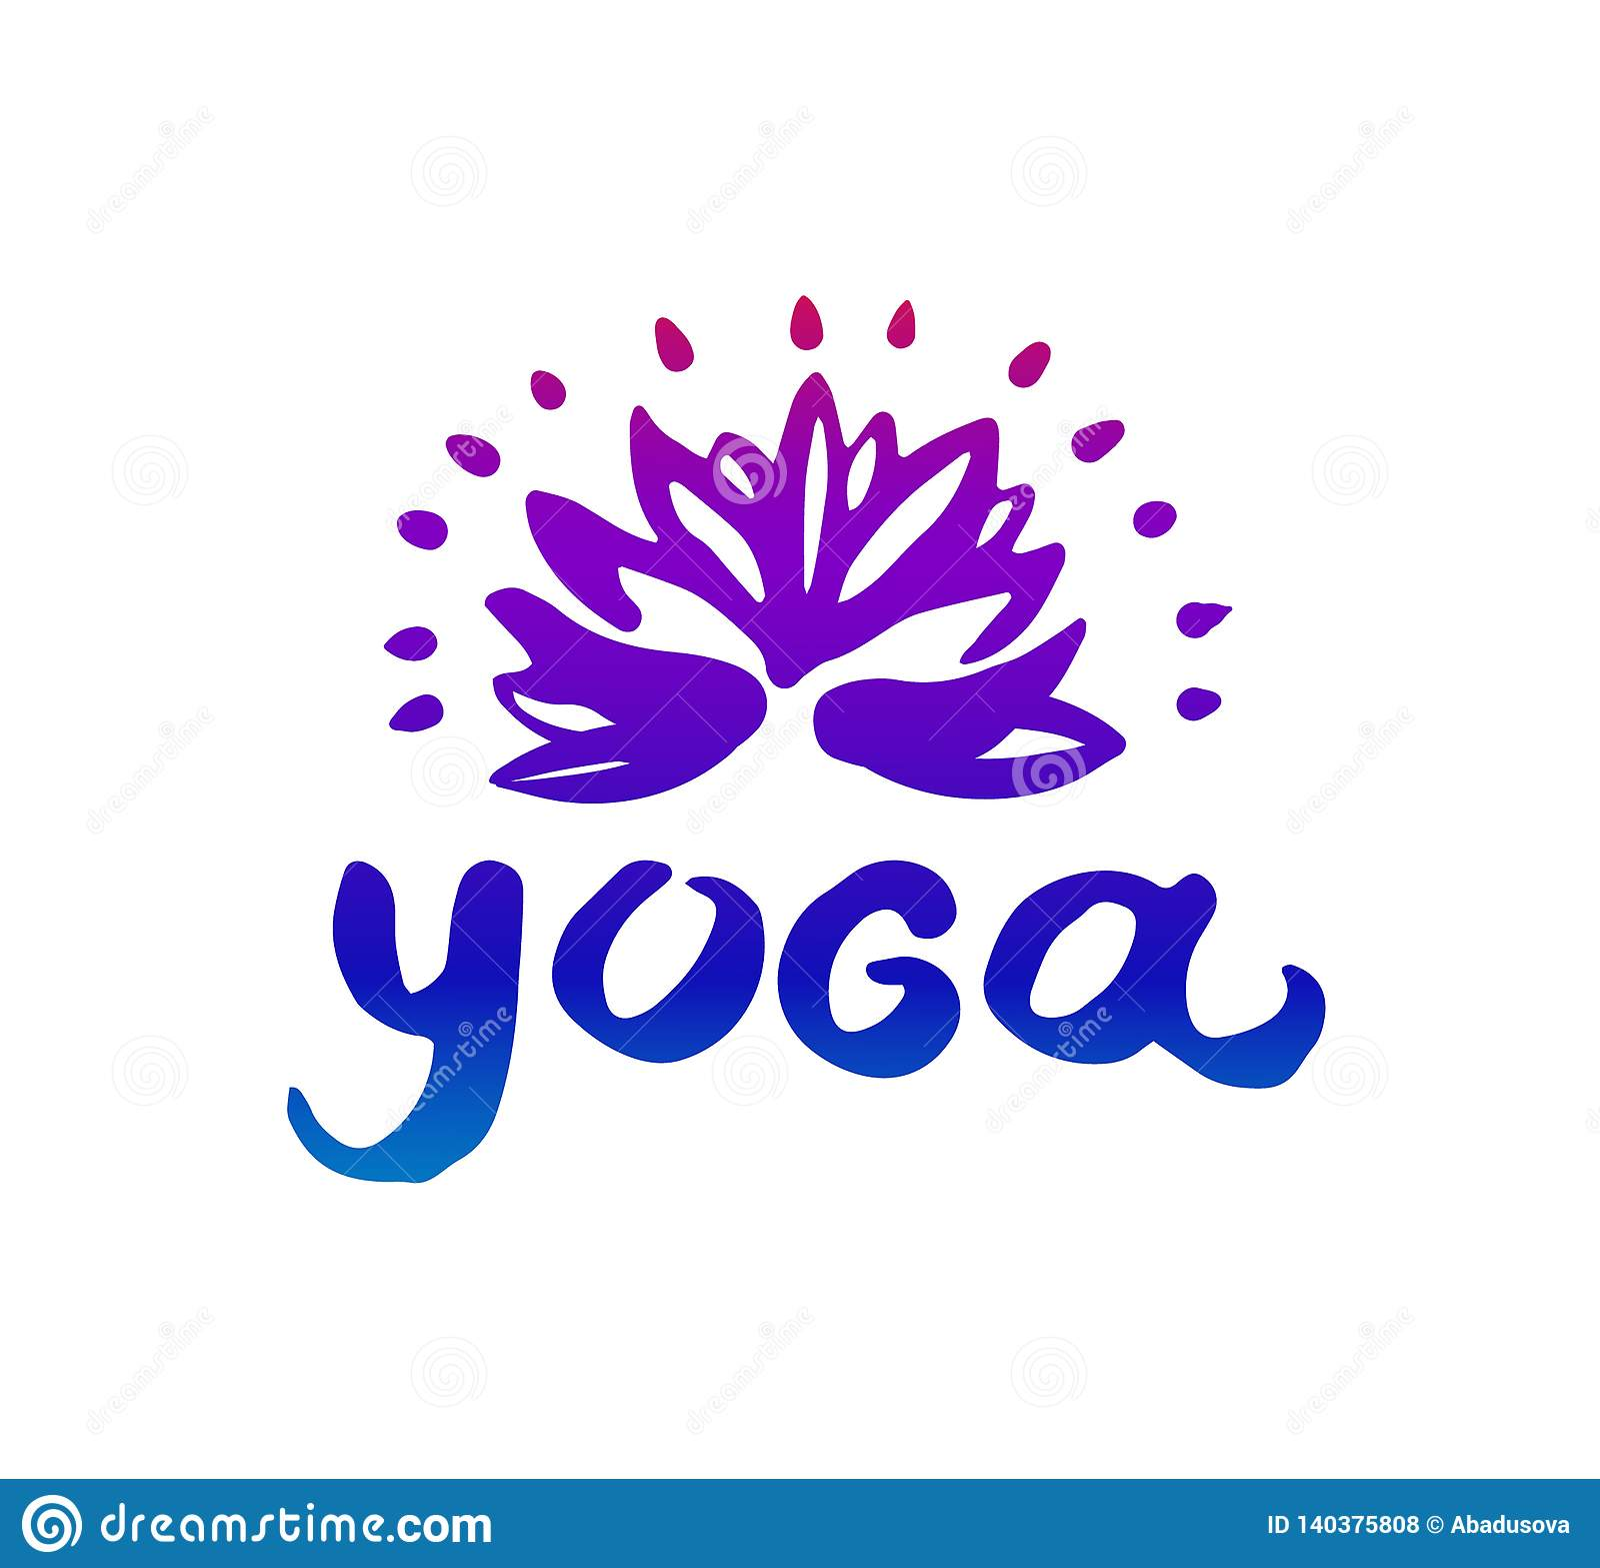 Vector hand drawn illustration of Yoga logo illustration on white background.